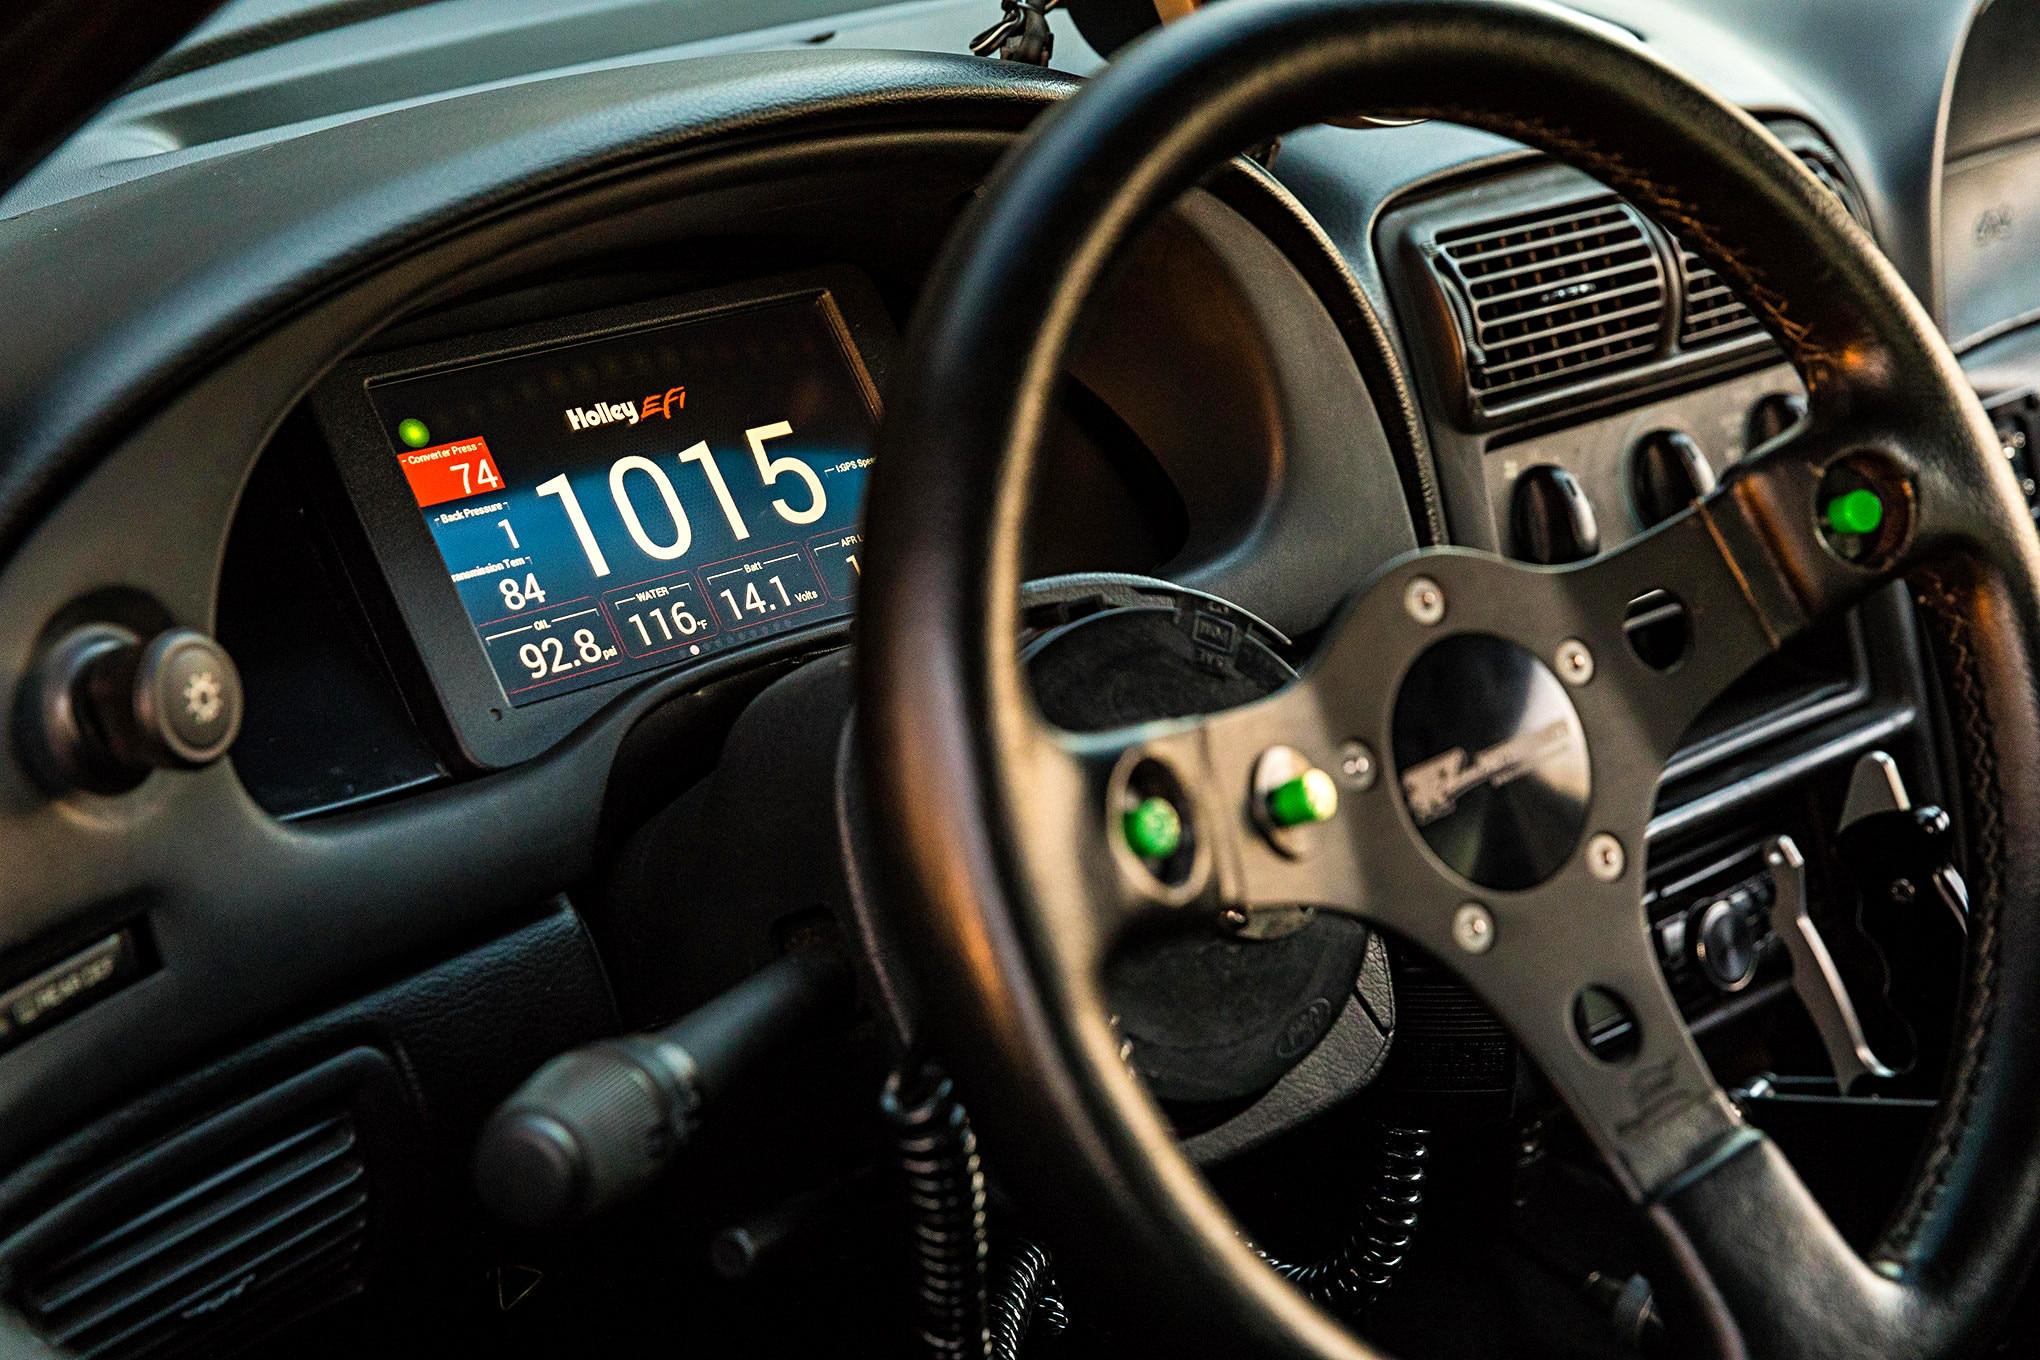 SN95 Kurtis Forsberg 1997 Ford Mustang Gt 018